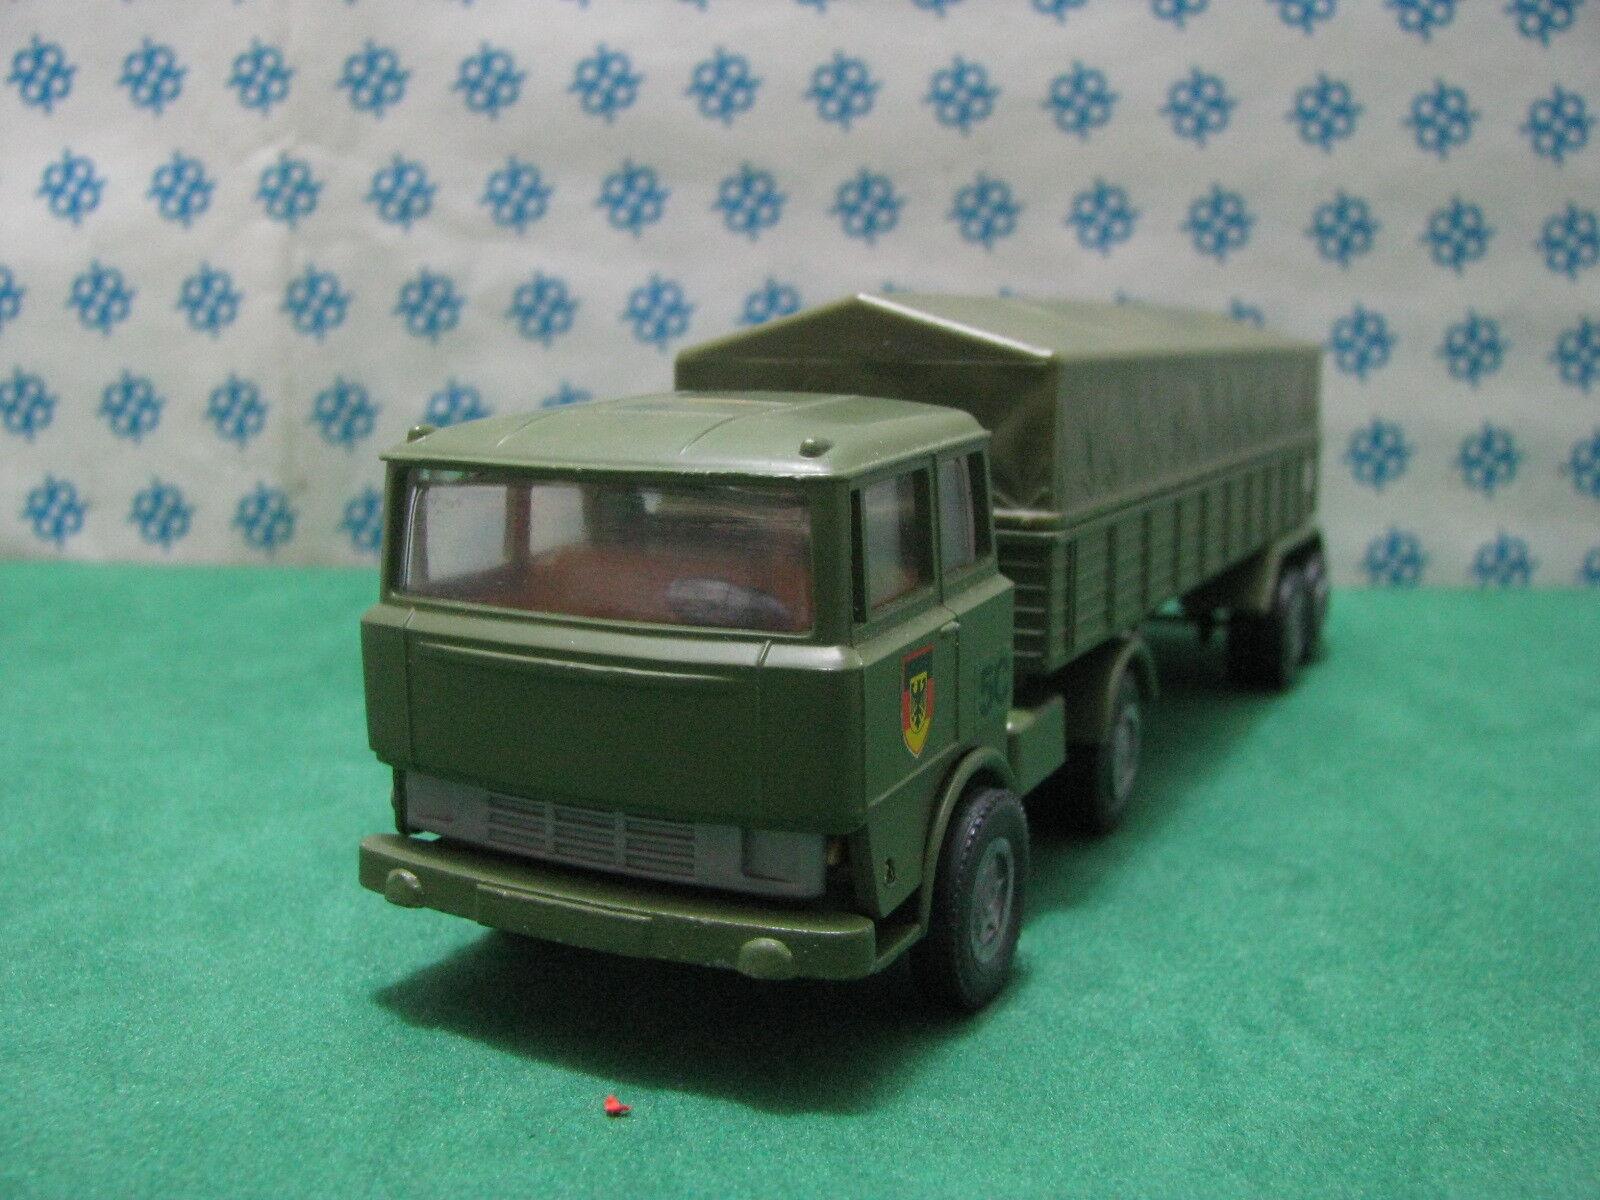 Vintage - Faun Lkw Militaire Remorque Inclinez les - Mini-Gama 921 W.Germany